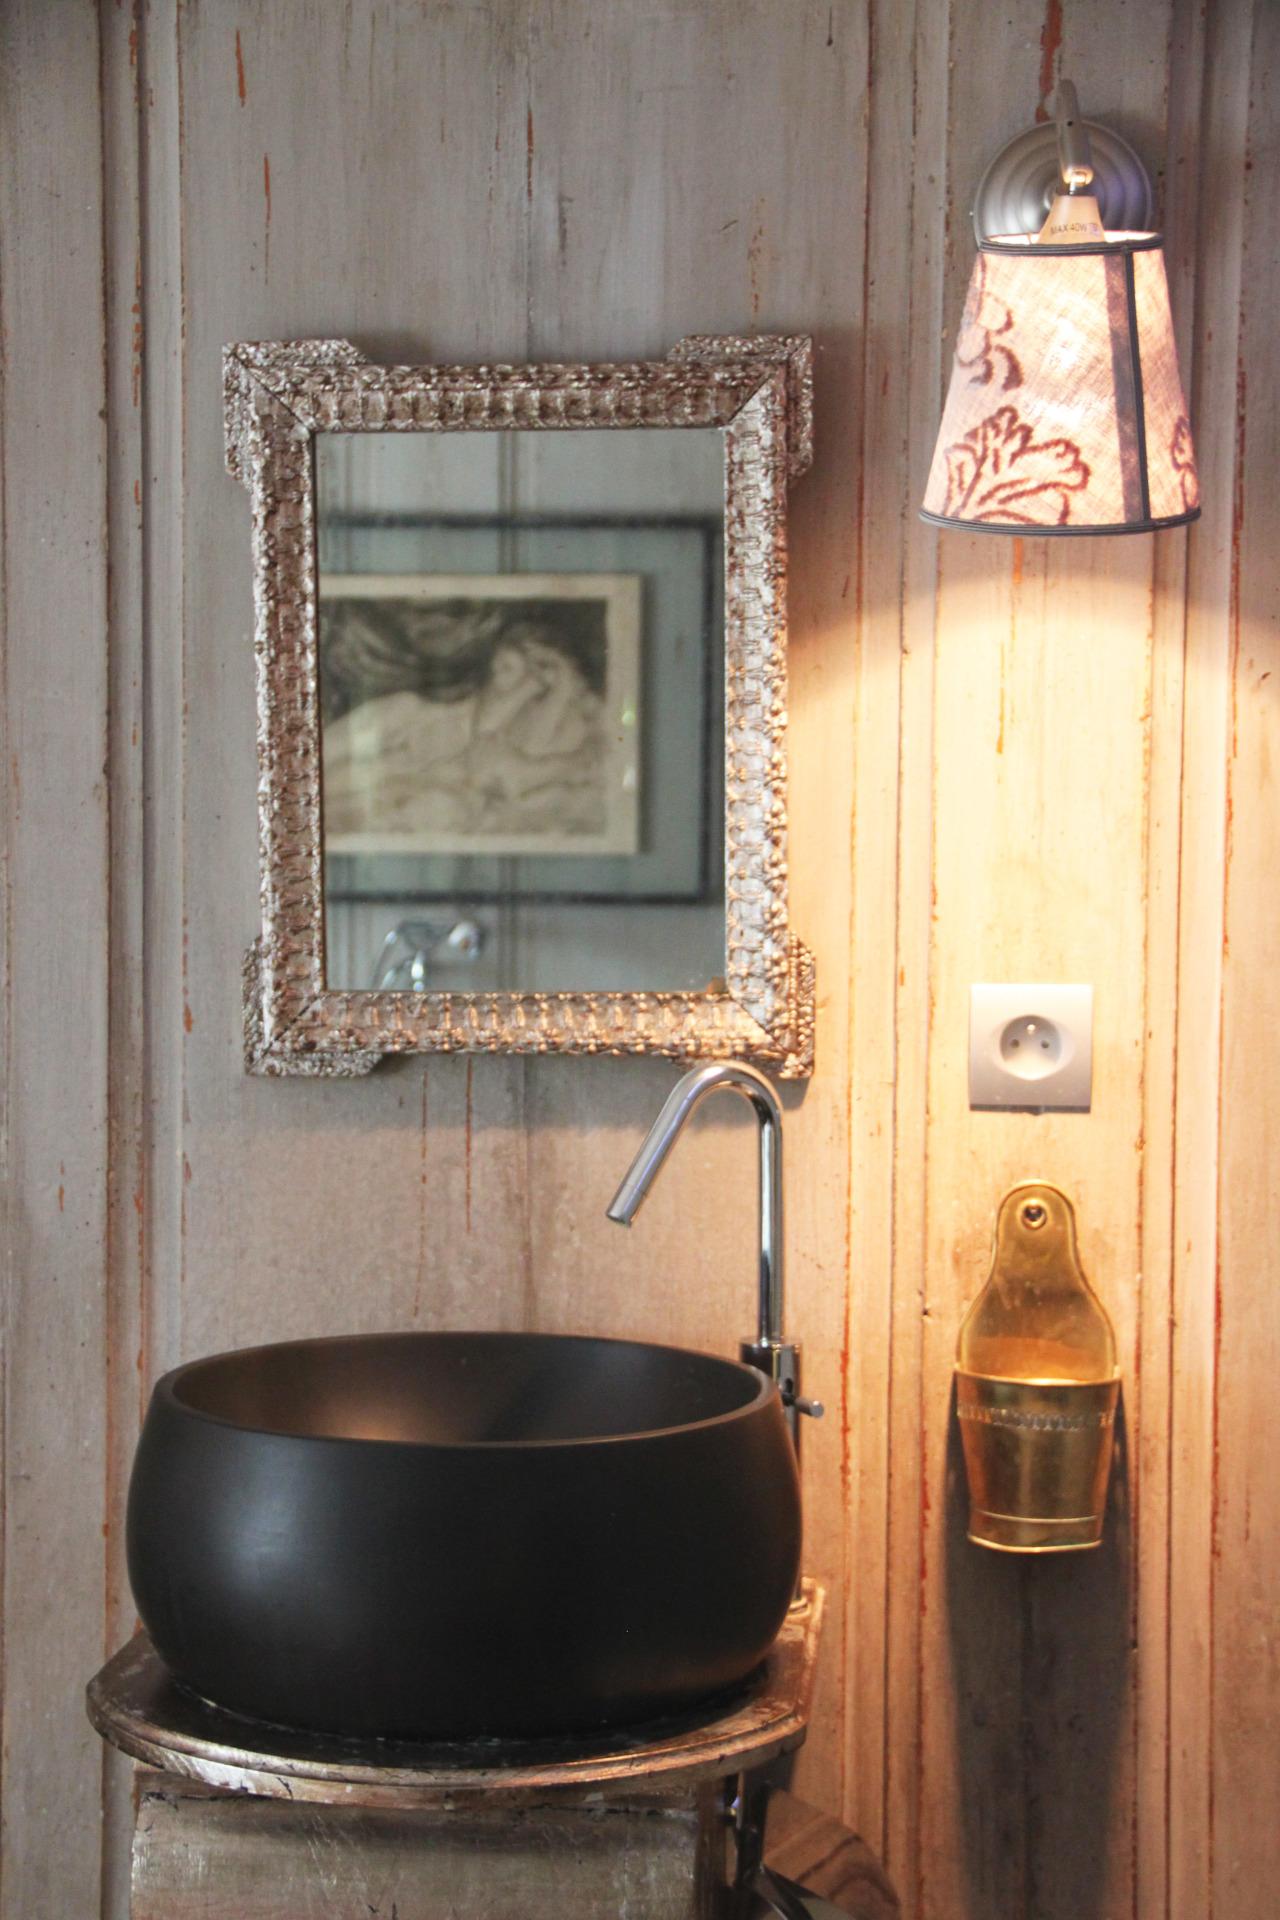 Vasque en pierre noire